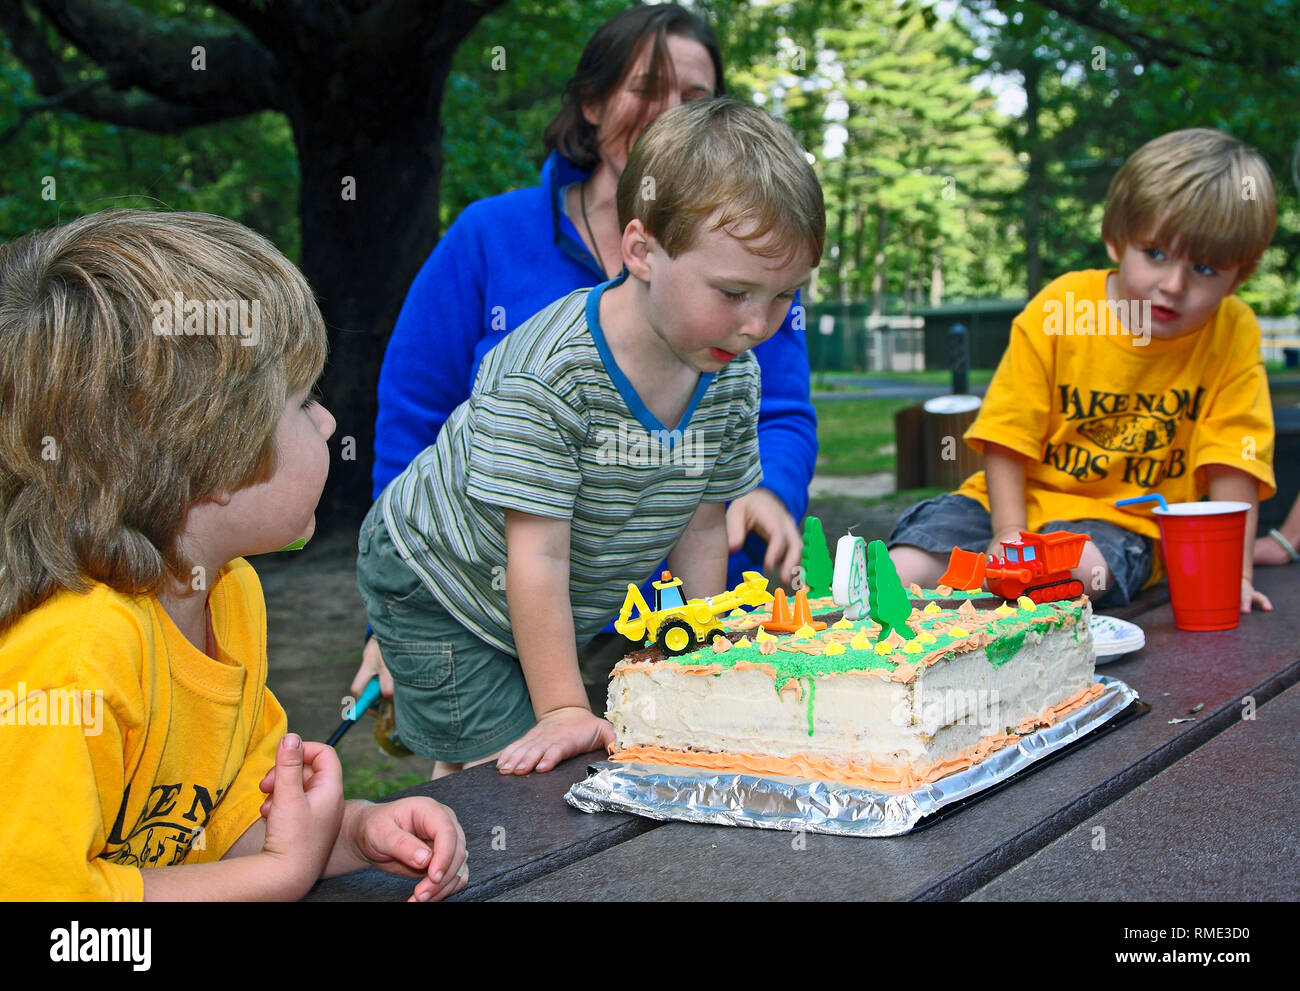 4 Year Old Boys Birthday Cake Truck Decorations Party Picnic Celebration Outdoors Dessert Fun Sweet Treat Food Summer Horizontal Mr Stock Photo Alamy